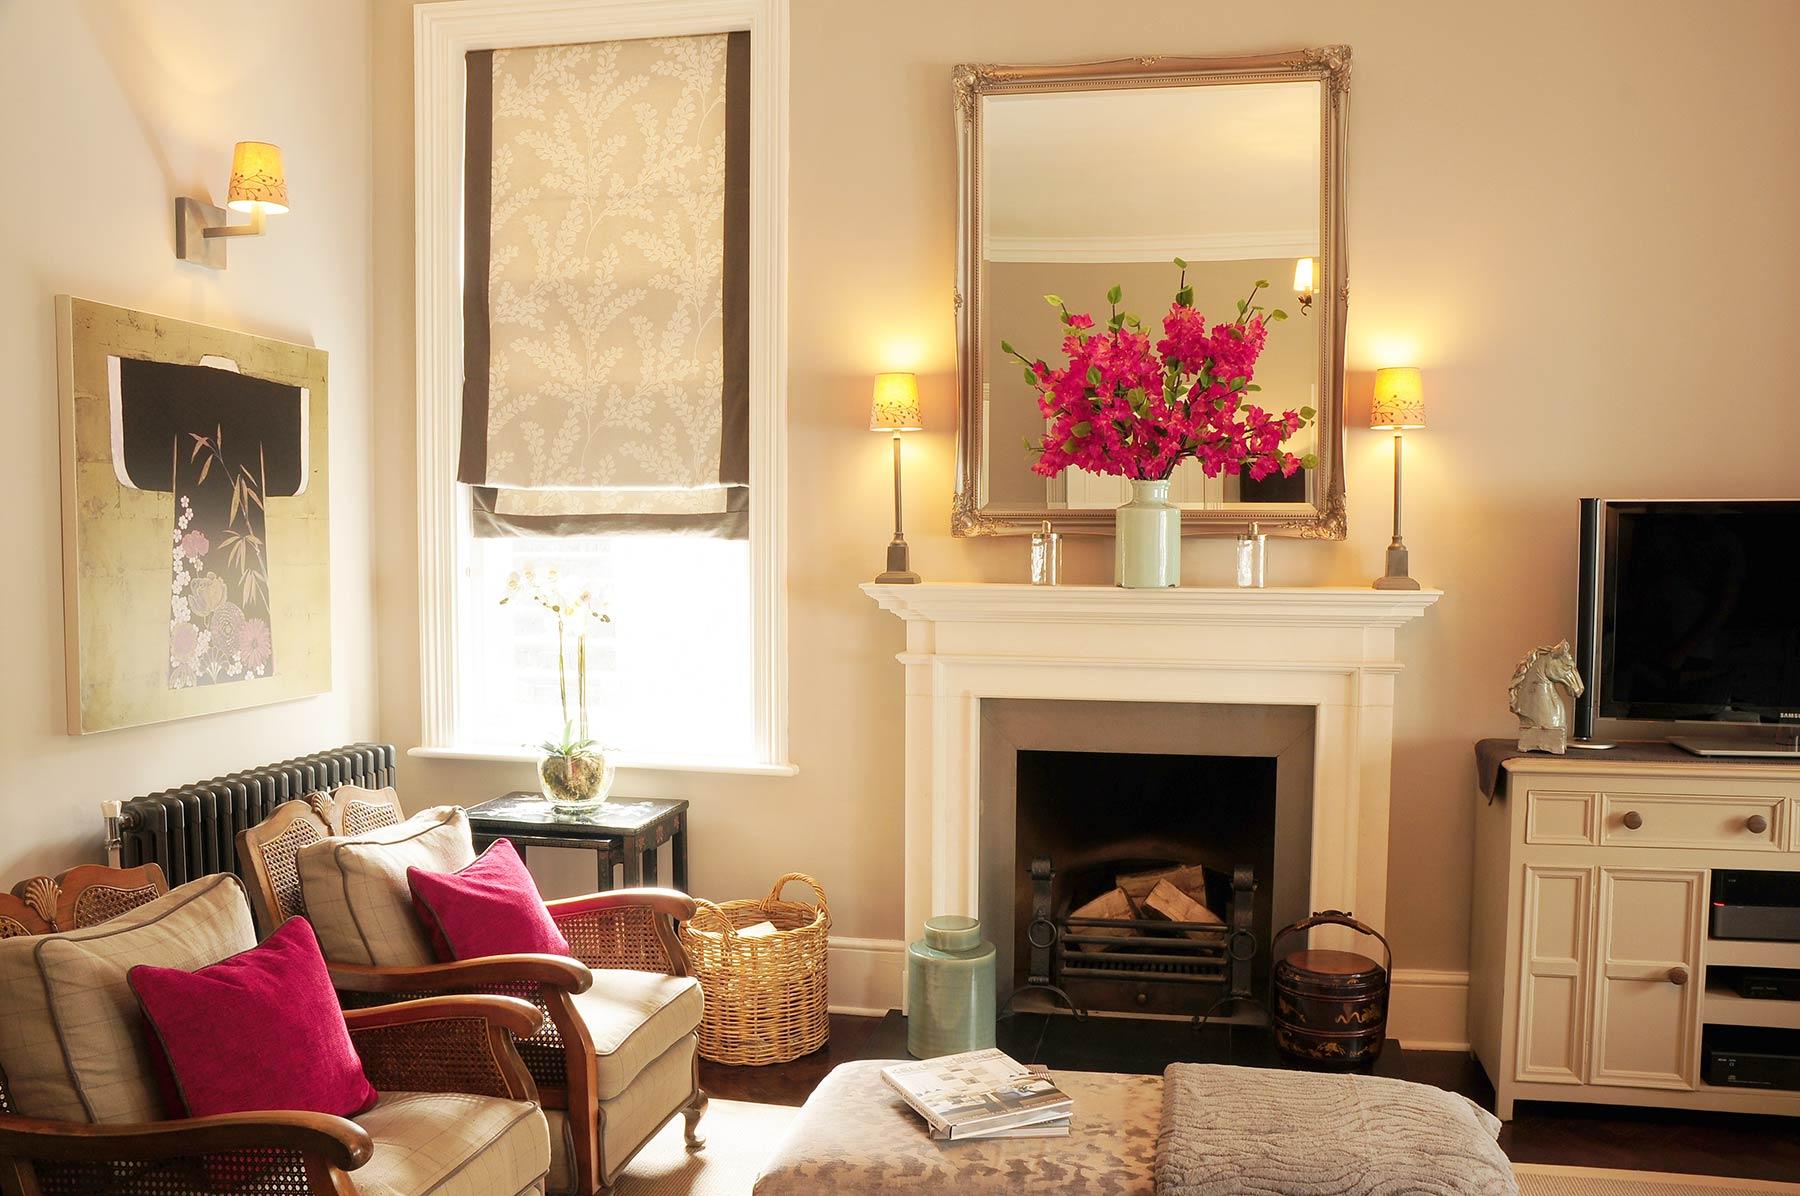 Interior Design Keston - Fire Place